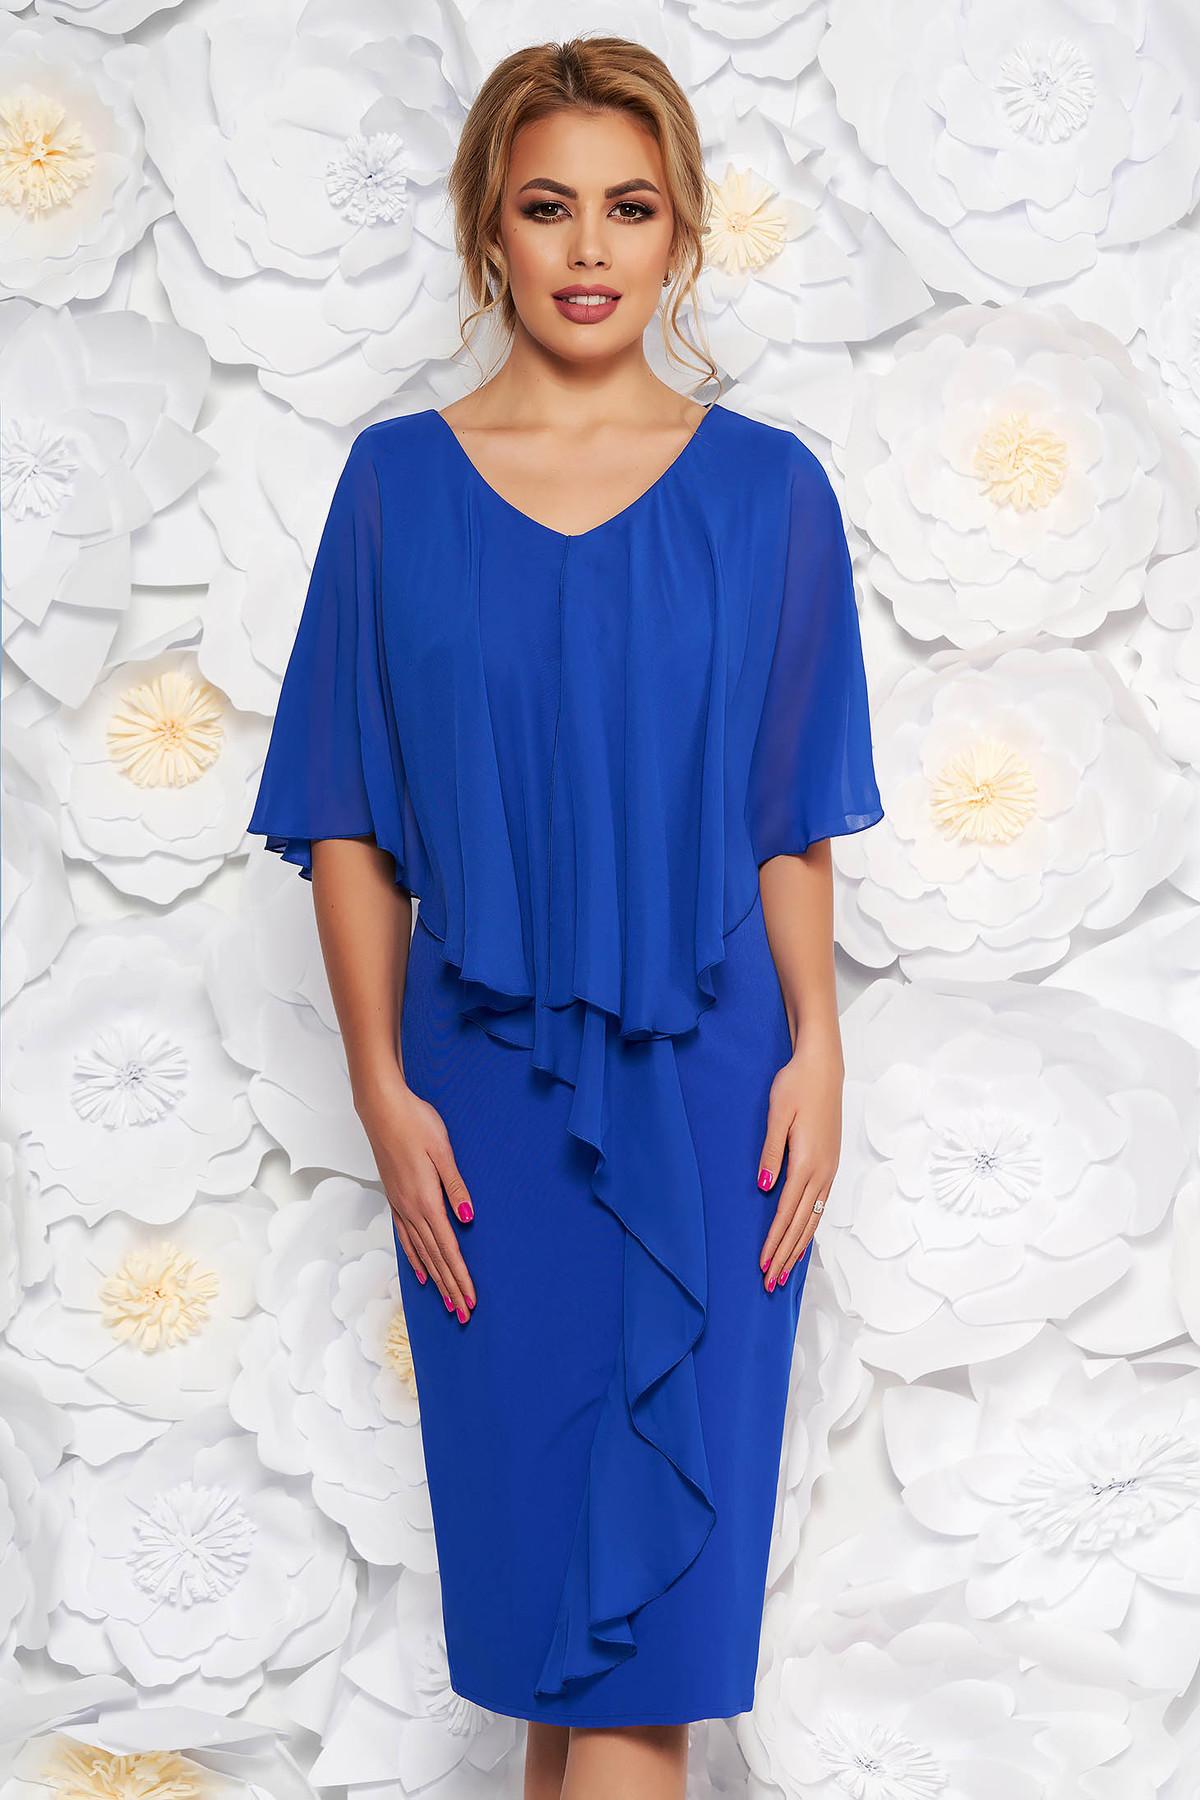 Rochie albastra de ocazie midi fara maneci cu un croi cambrat din stofa subtire usor elastica suprapunere cu voal